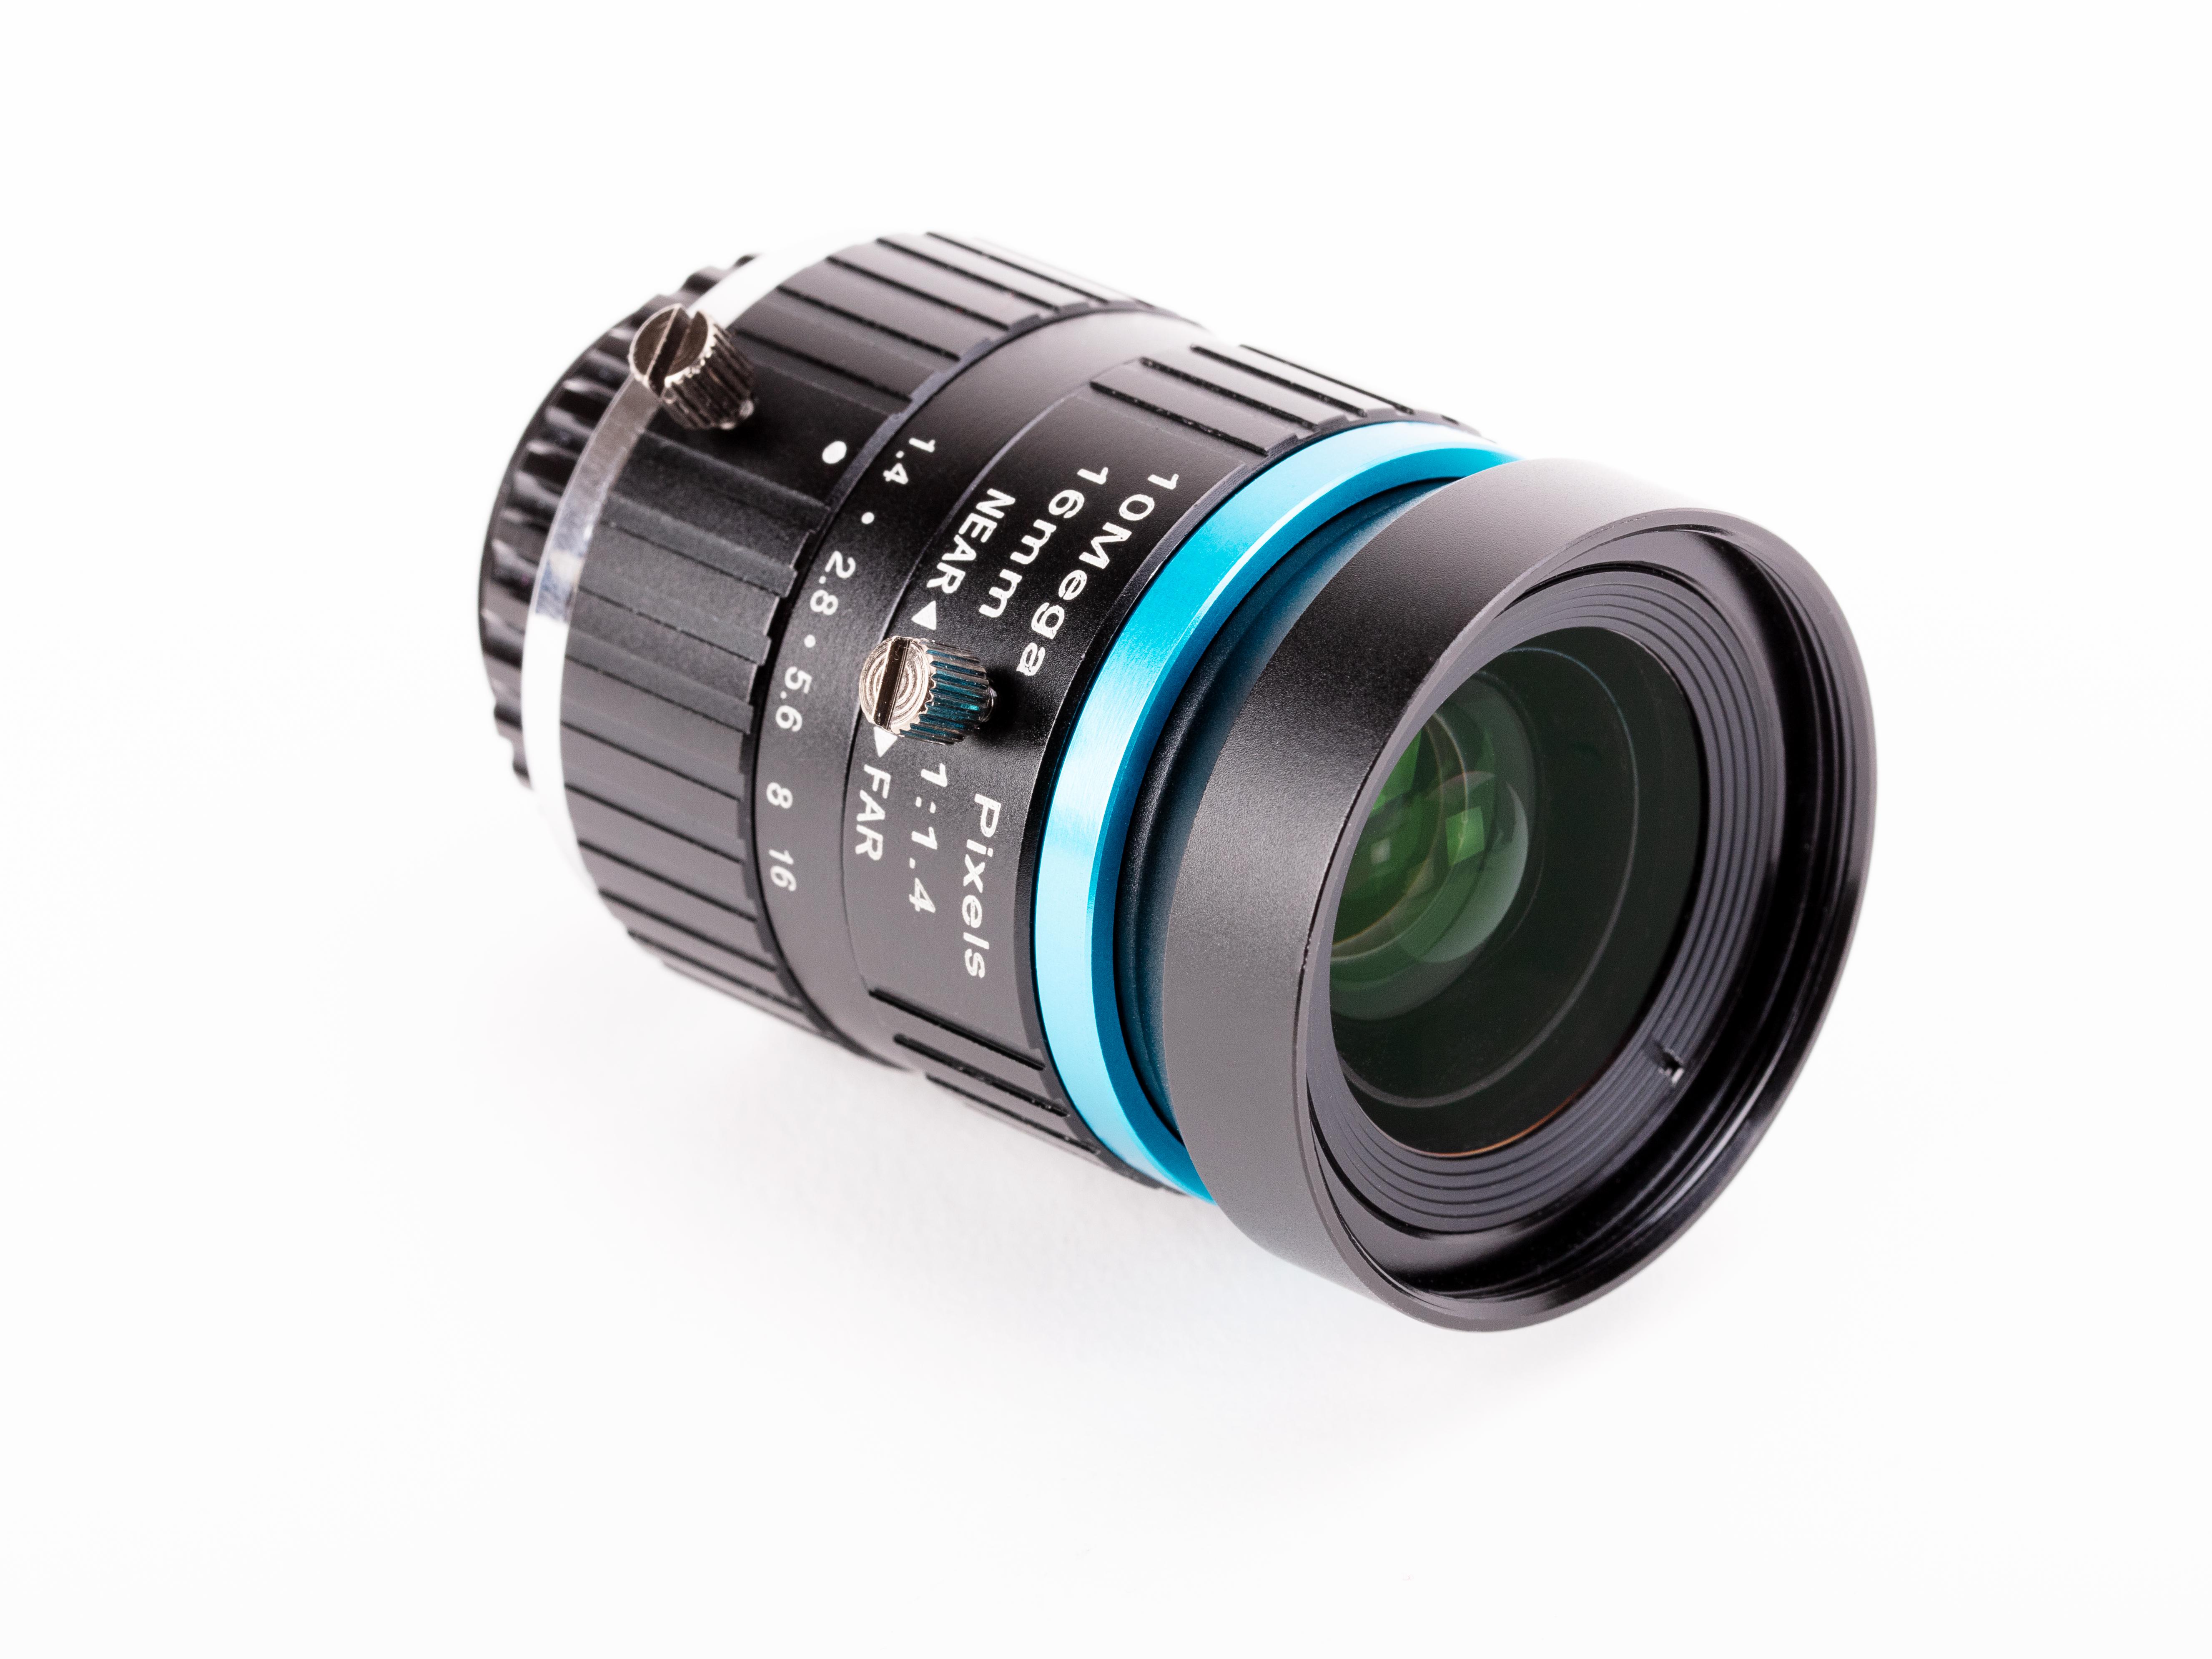 16mm Telephoto Lens